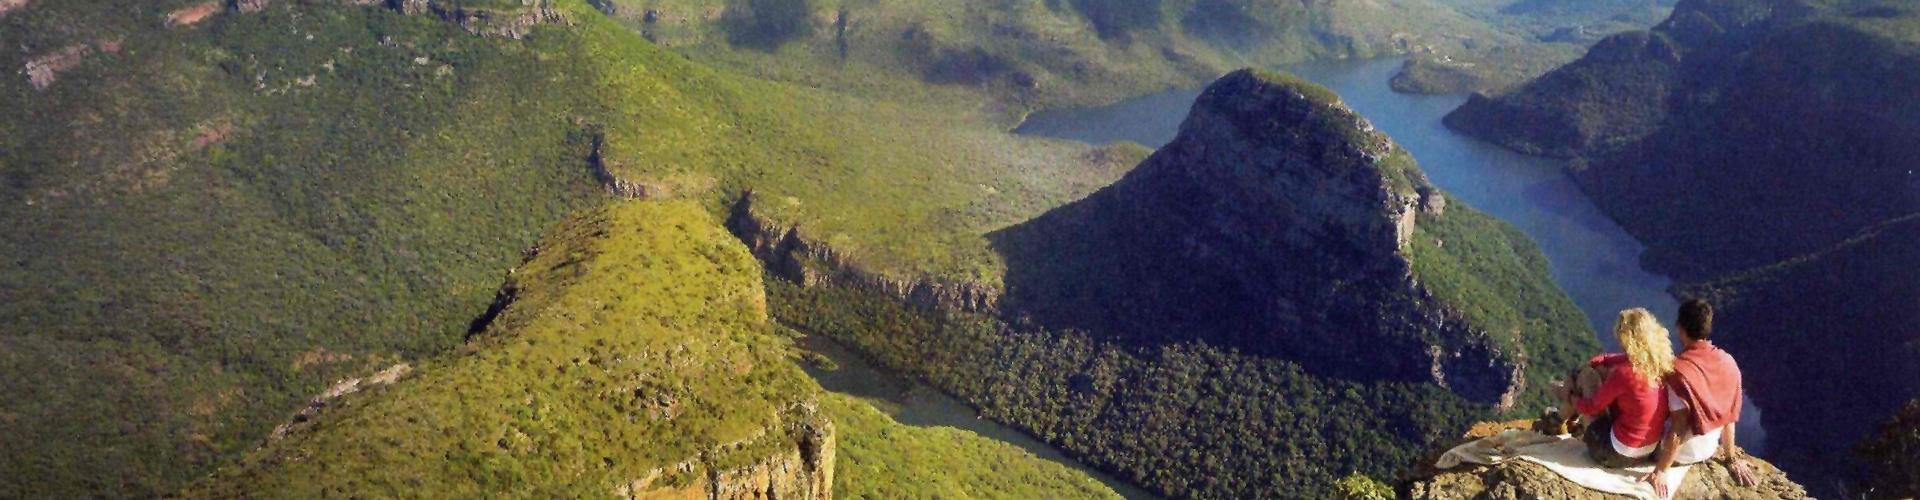 header-panorama-route-informatie-zuid-afrika-1920x500-1